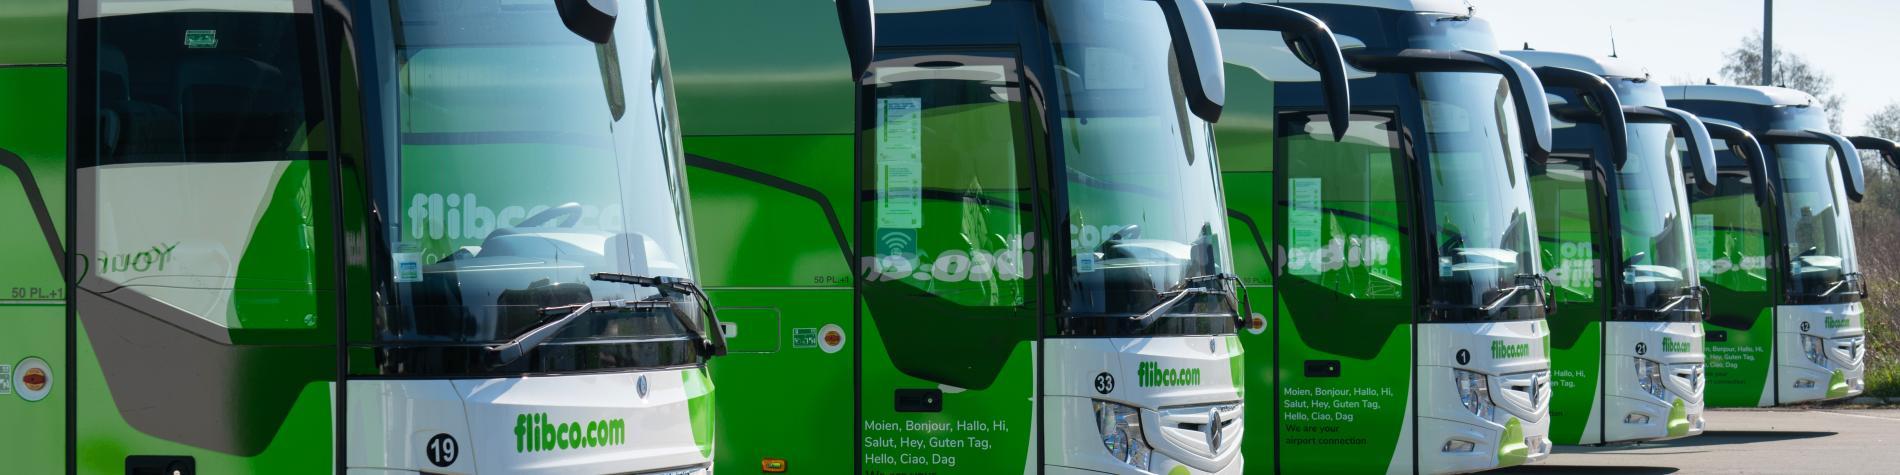 Flibco.com - Parking de bus - aéroport